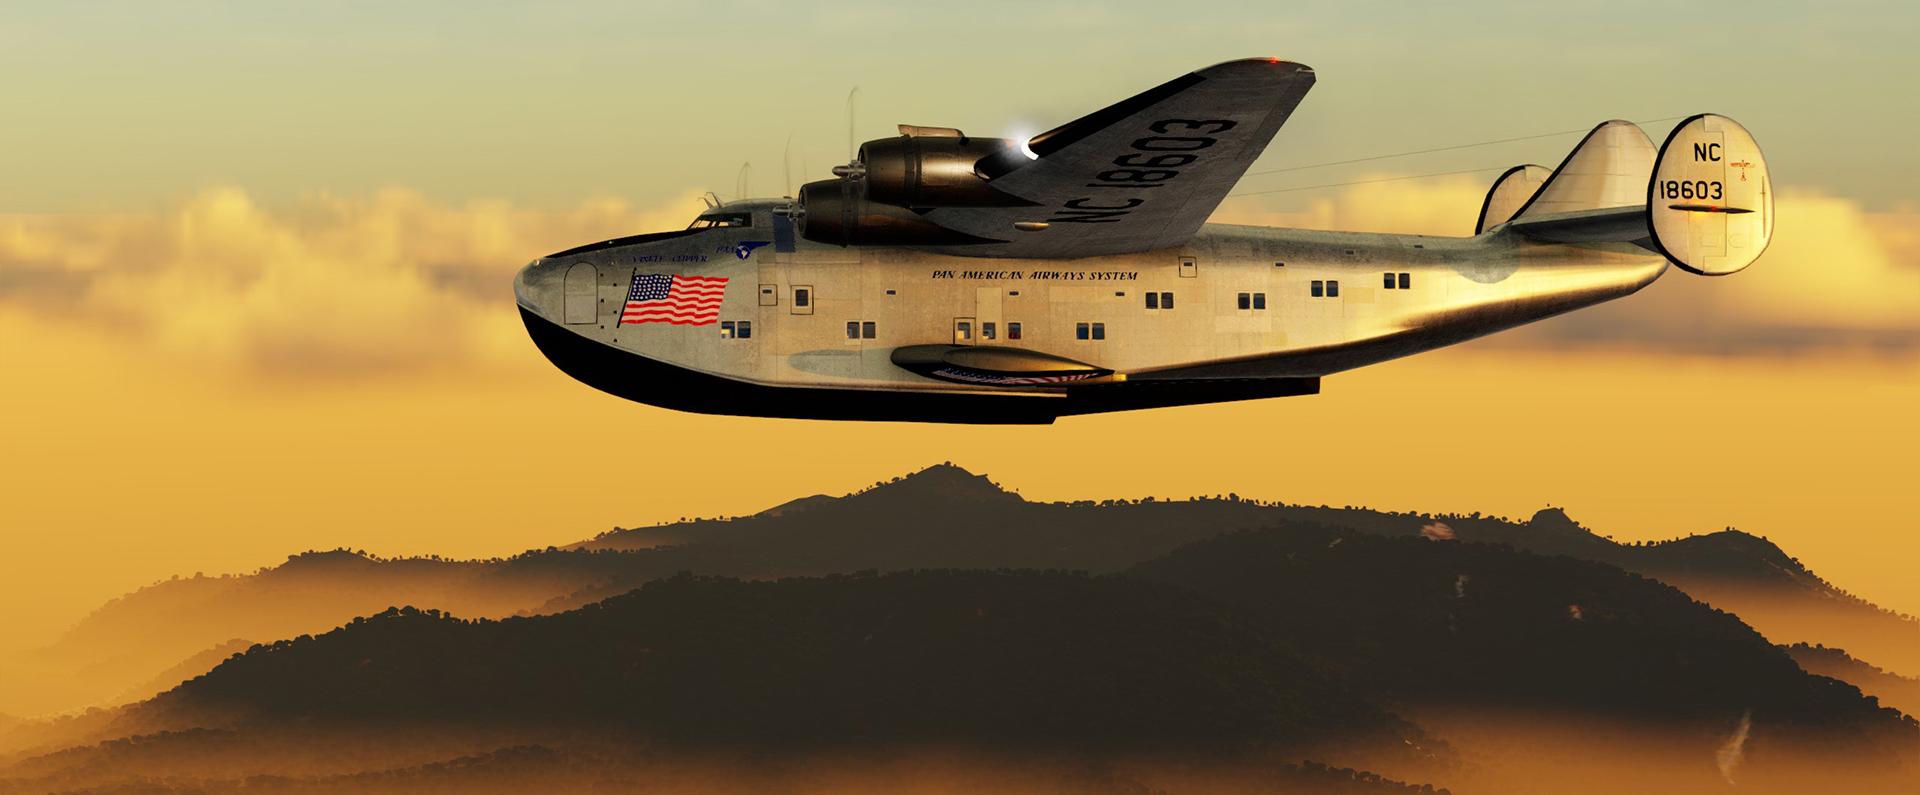 Tour Feature - Fords Flight